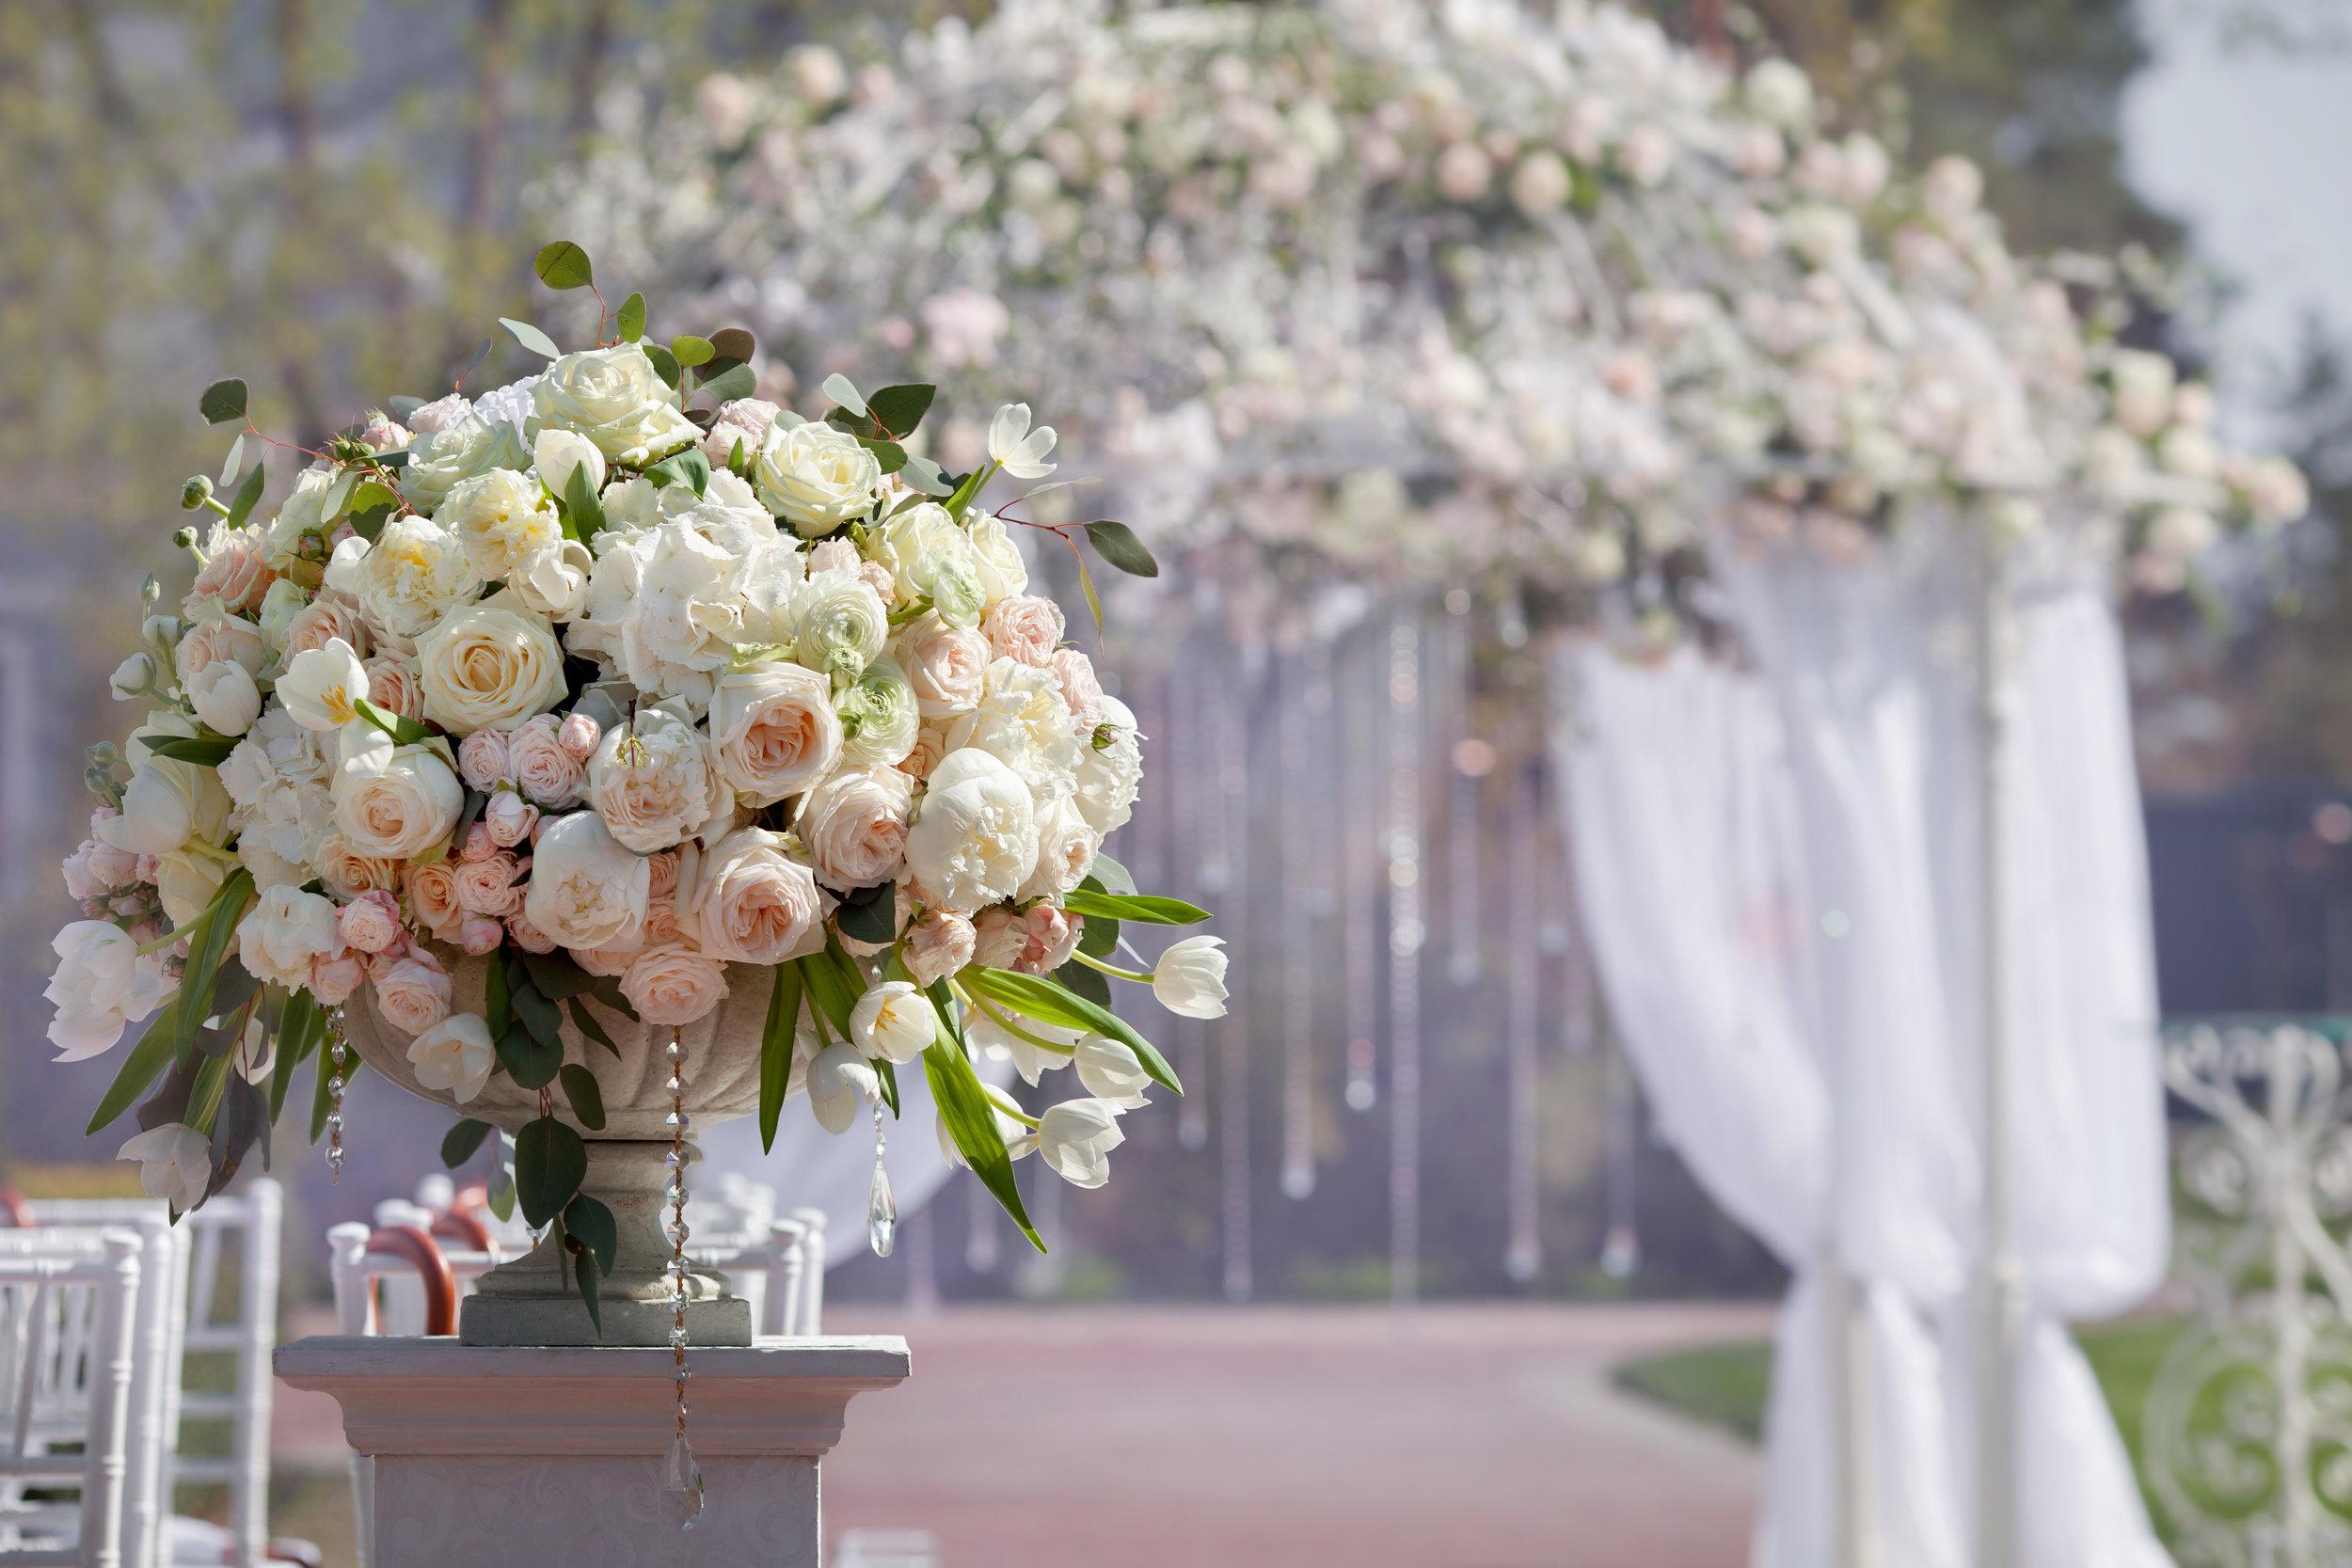 Olive Sky_Weddings Abroad39.jpeg